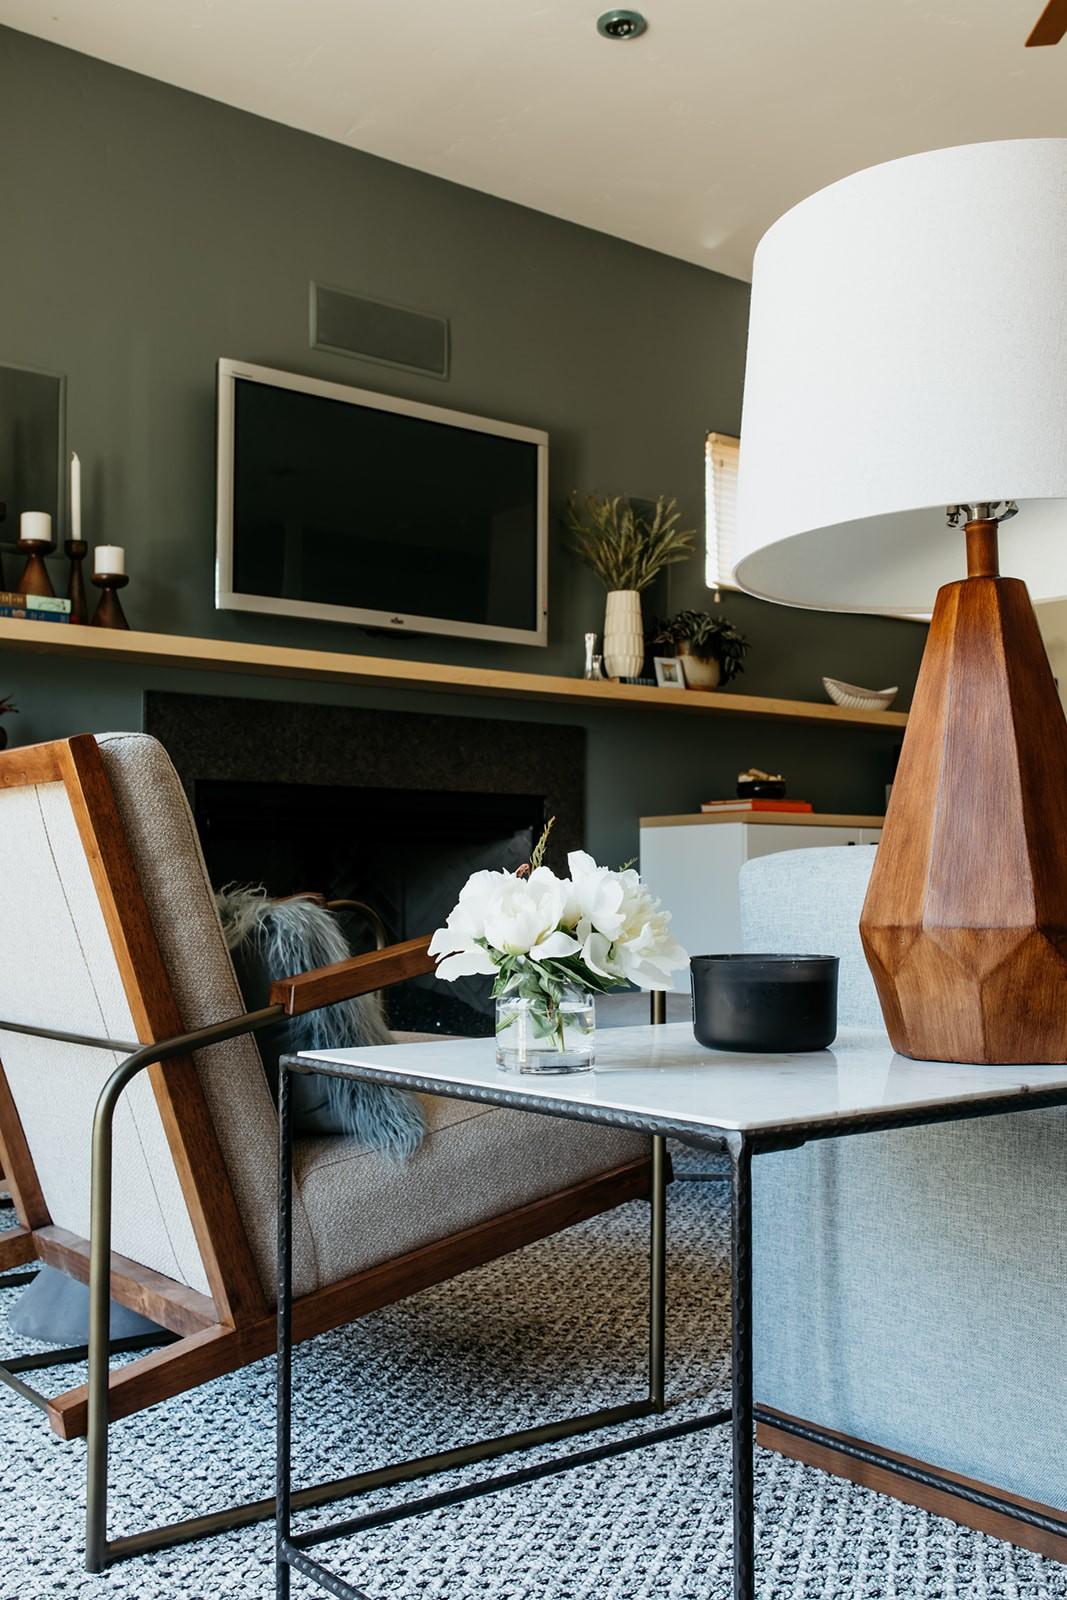 20180613_Nicolette_Lovell_Sacramento_Interior_Studio Plumb-9707